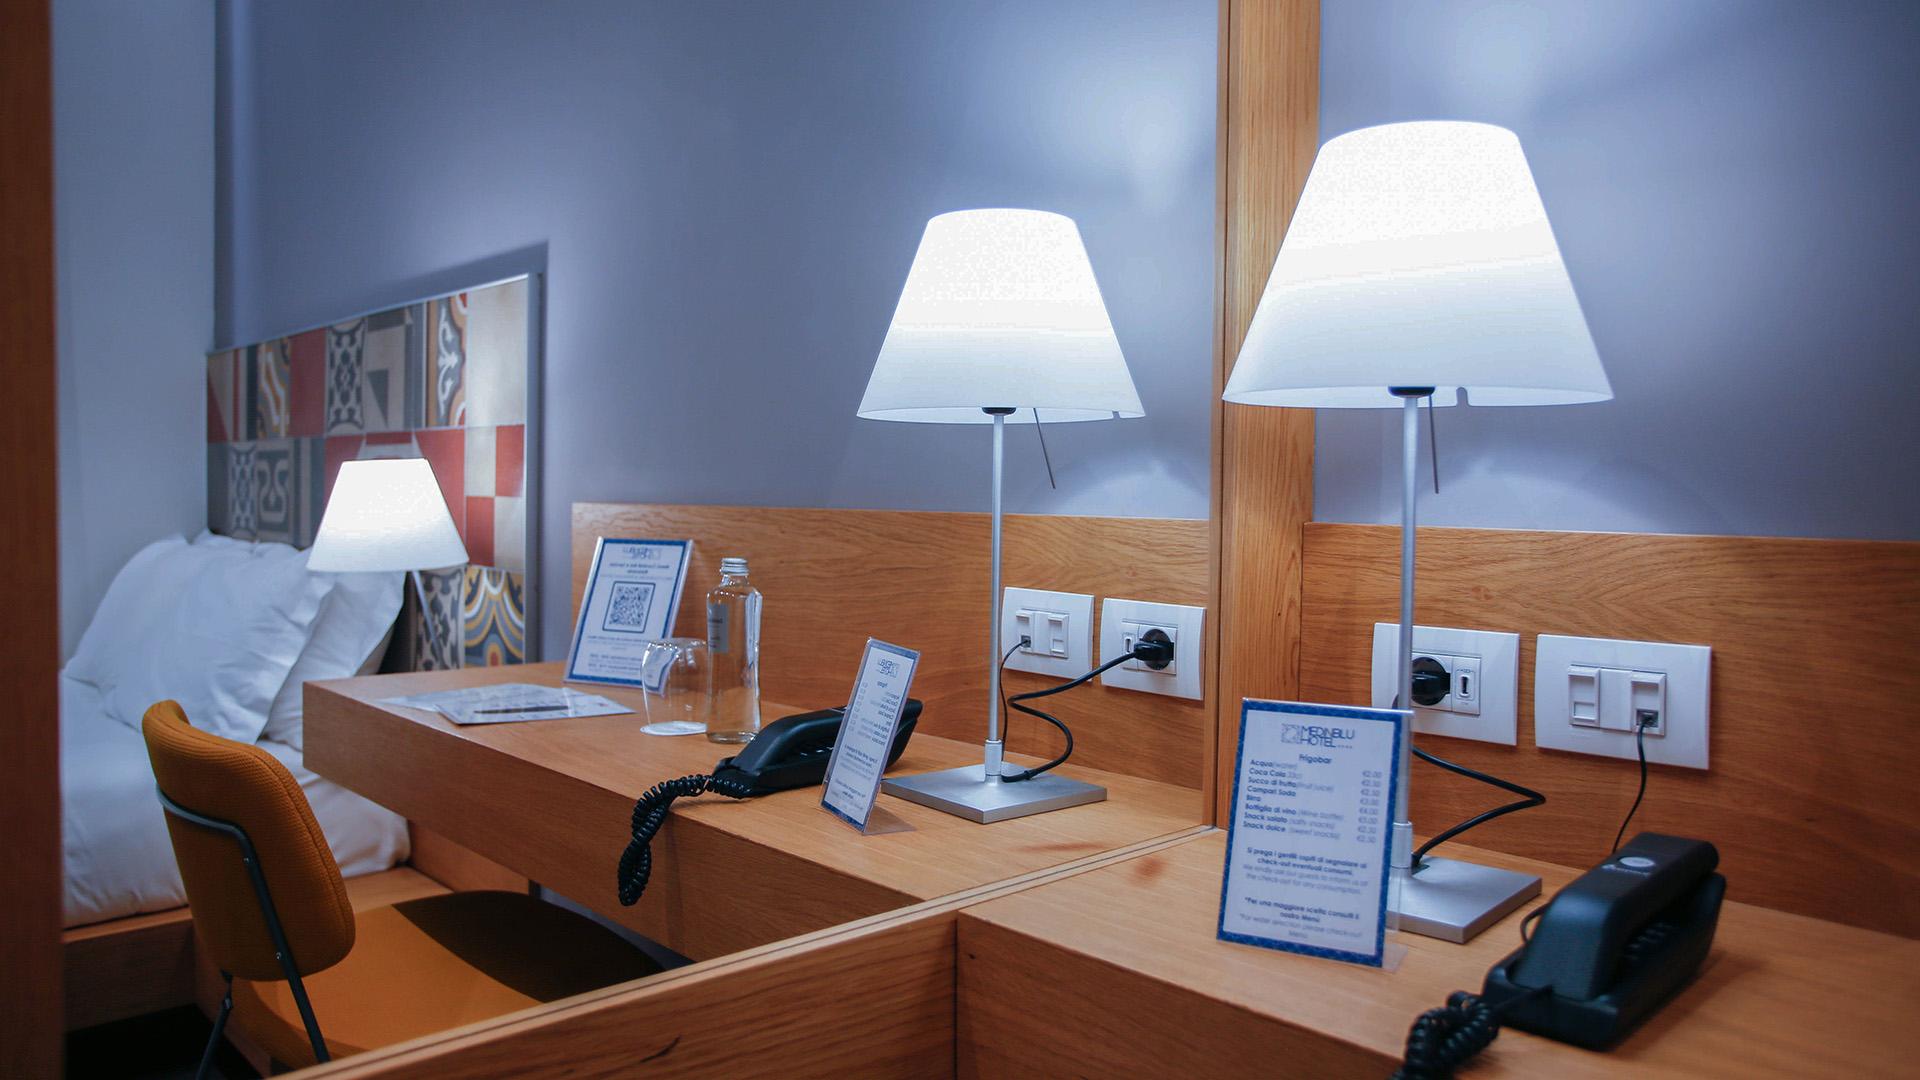 Hotel Medinblu-Standard Accesso Disabile-02